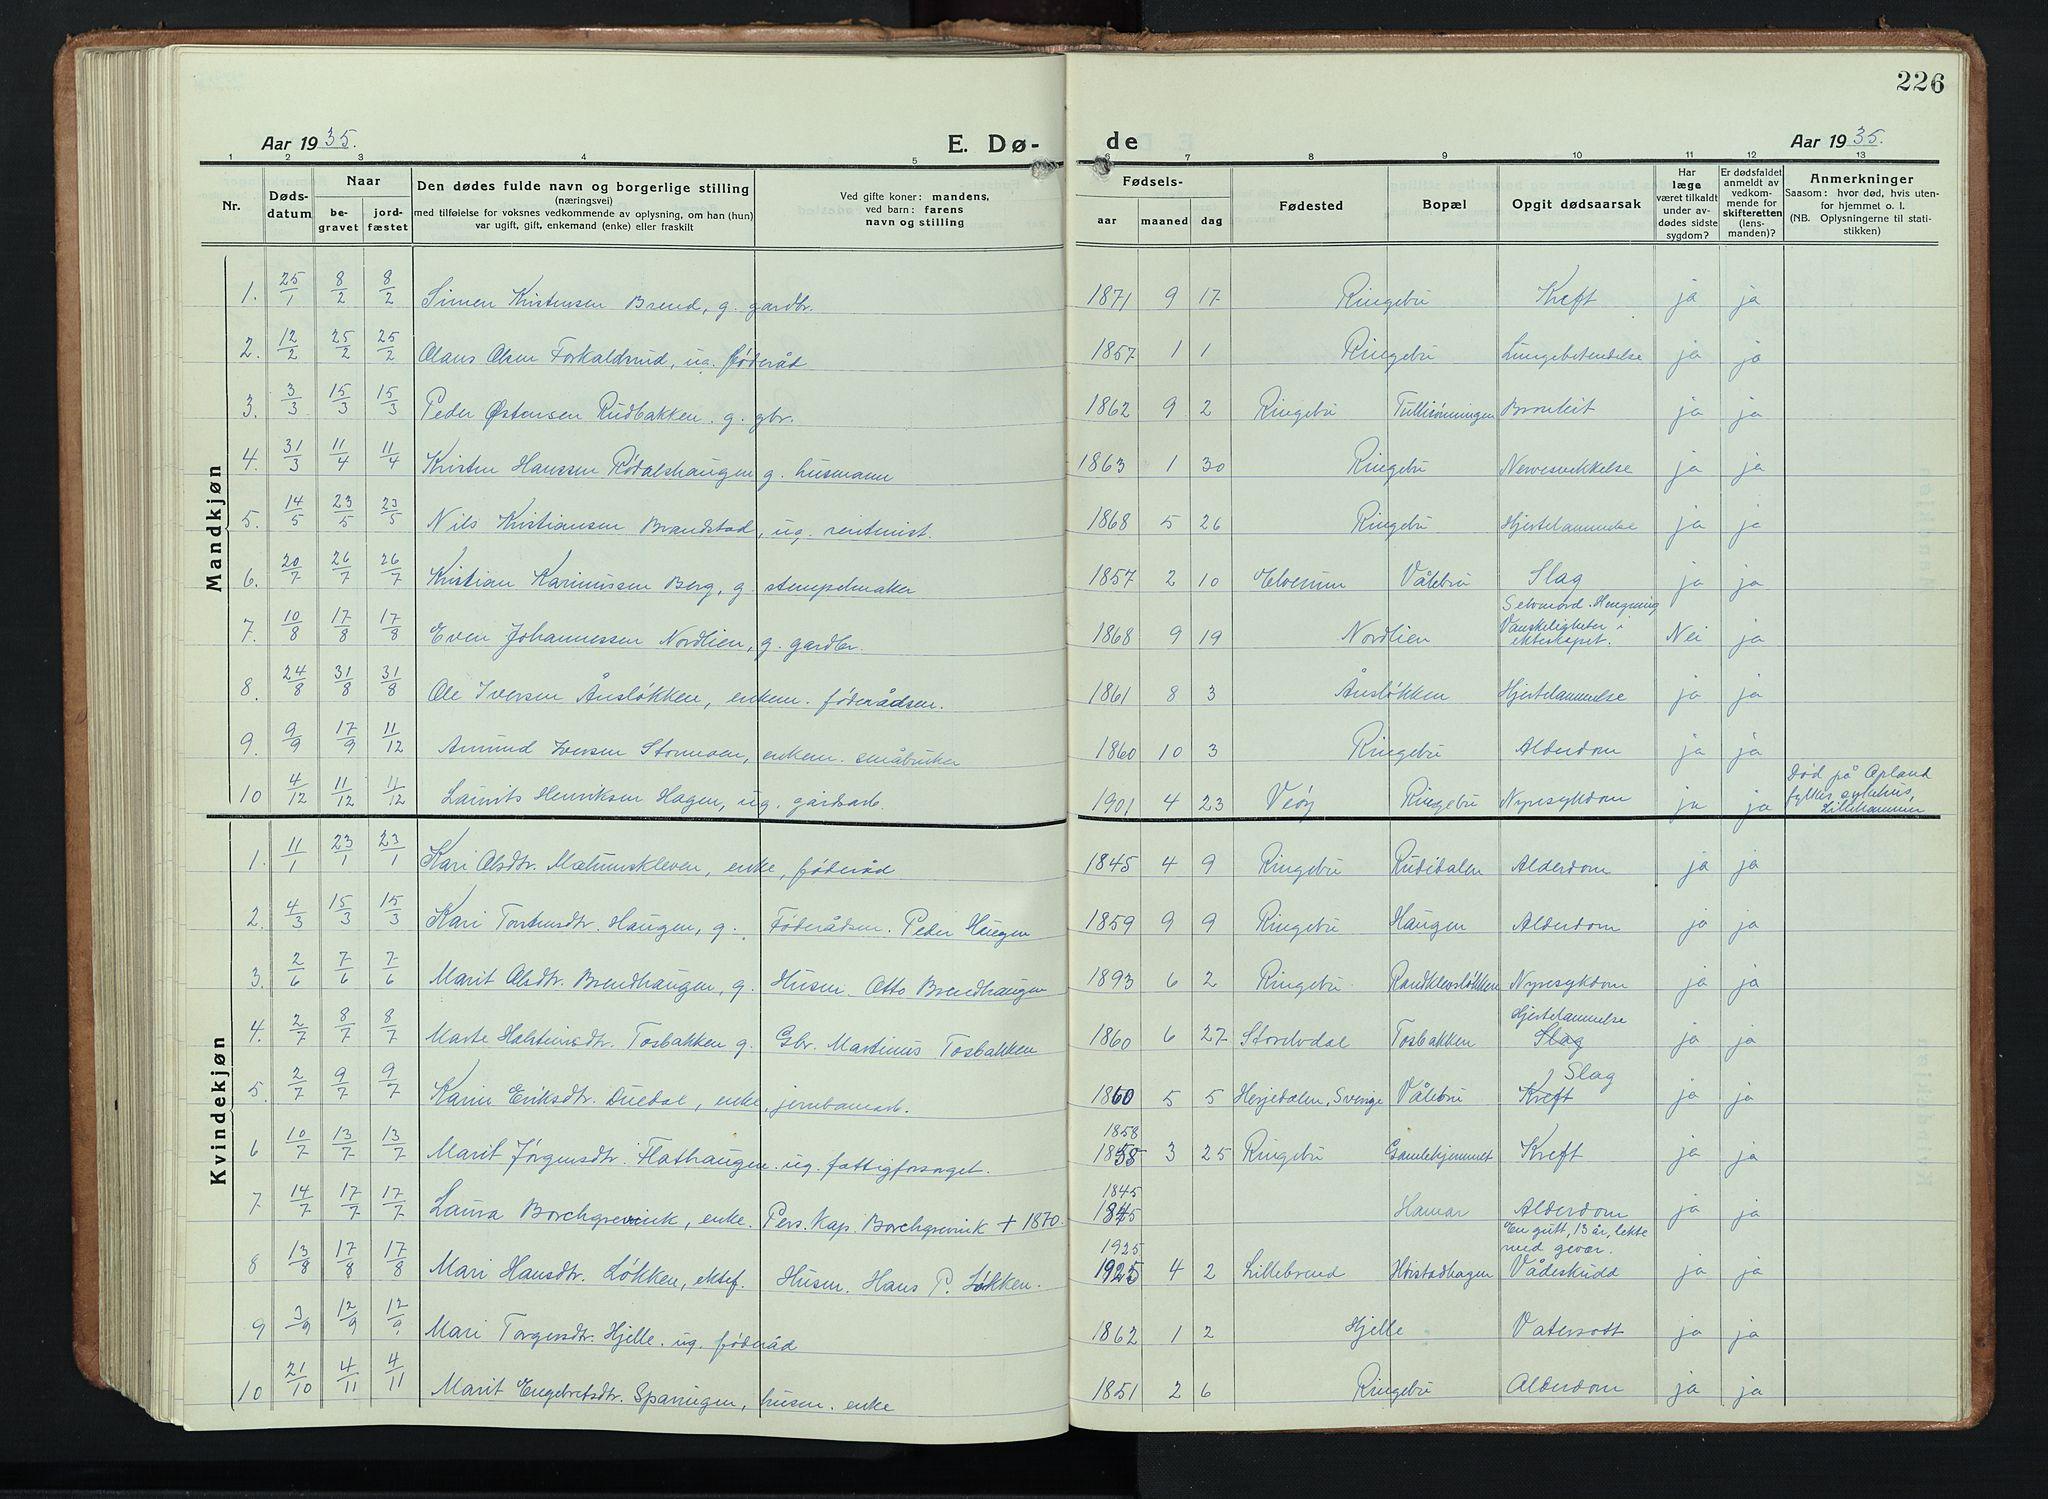 SAH, Ringebu prestekontor, Klokkerbok nr. 11, 1921-1943, s. 226